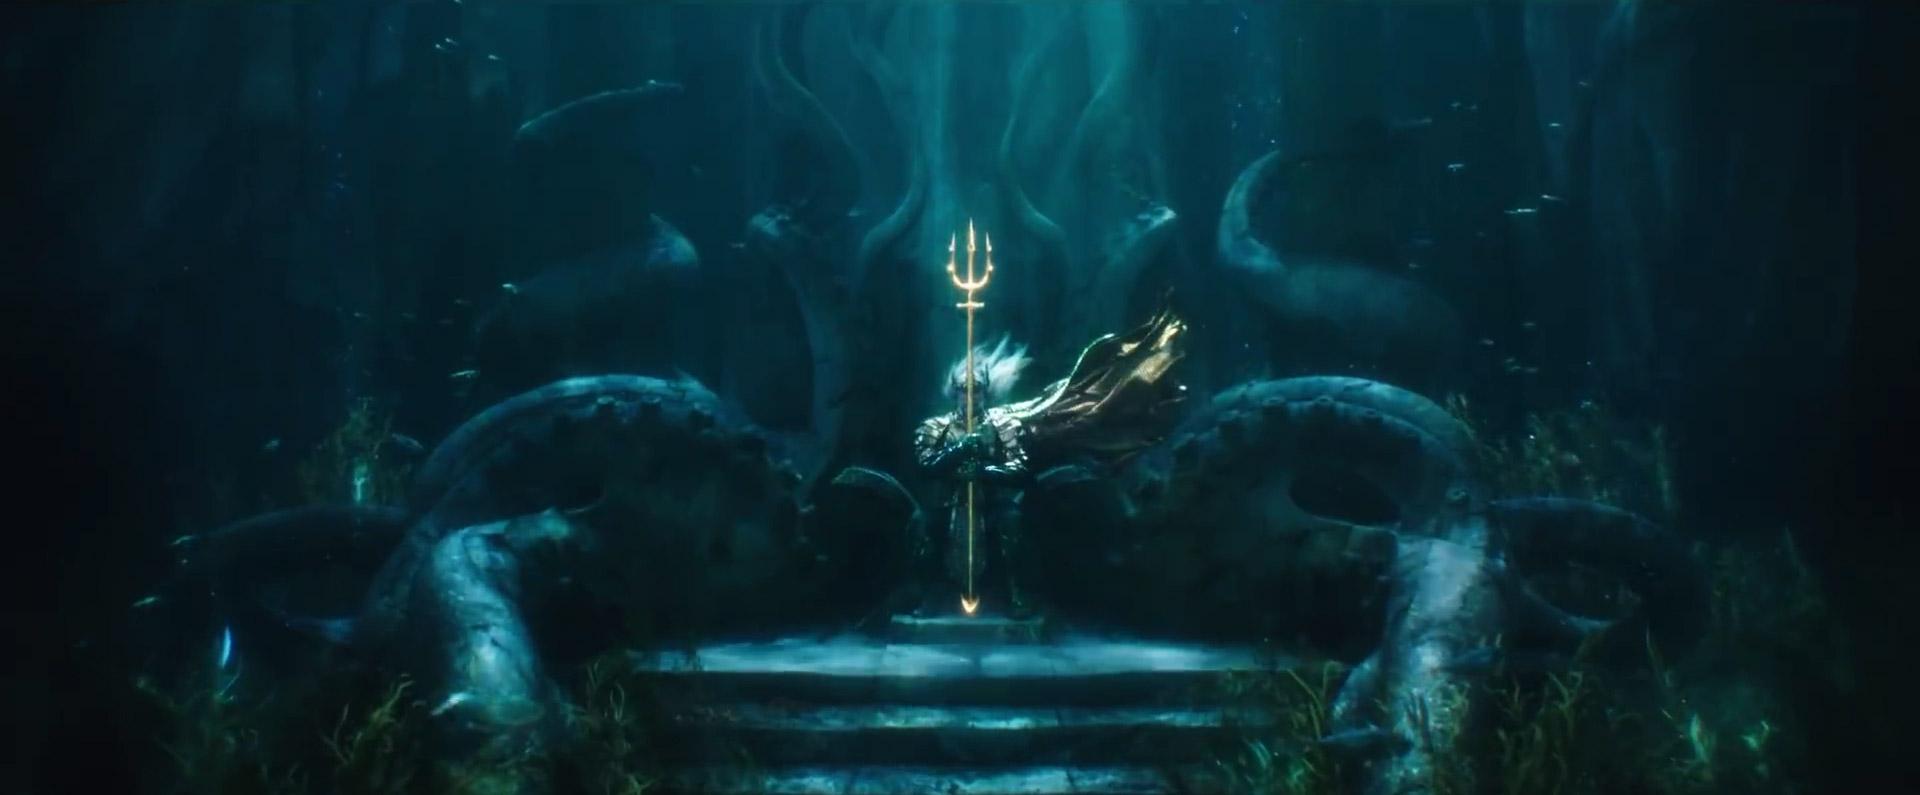 Stunning Final Trailer for Aquaman!